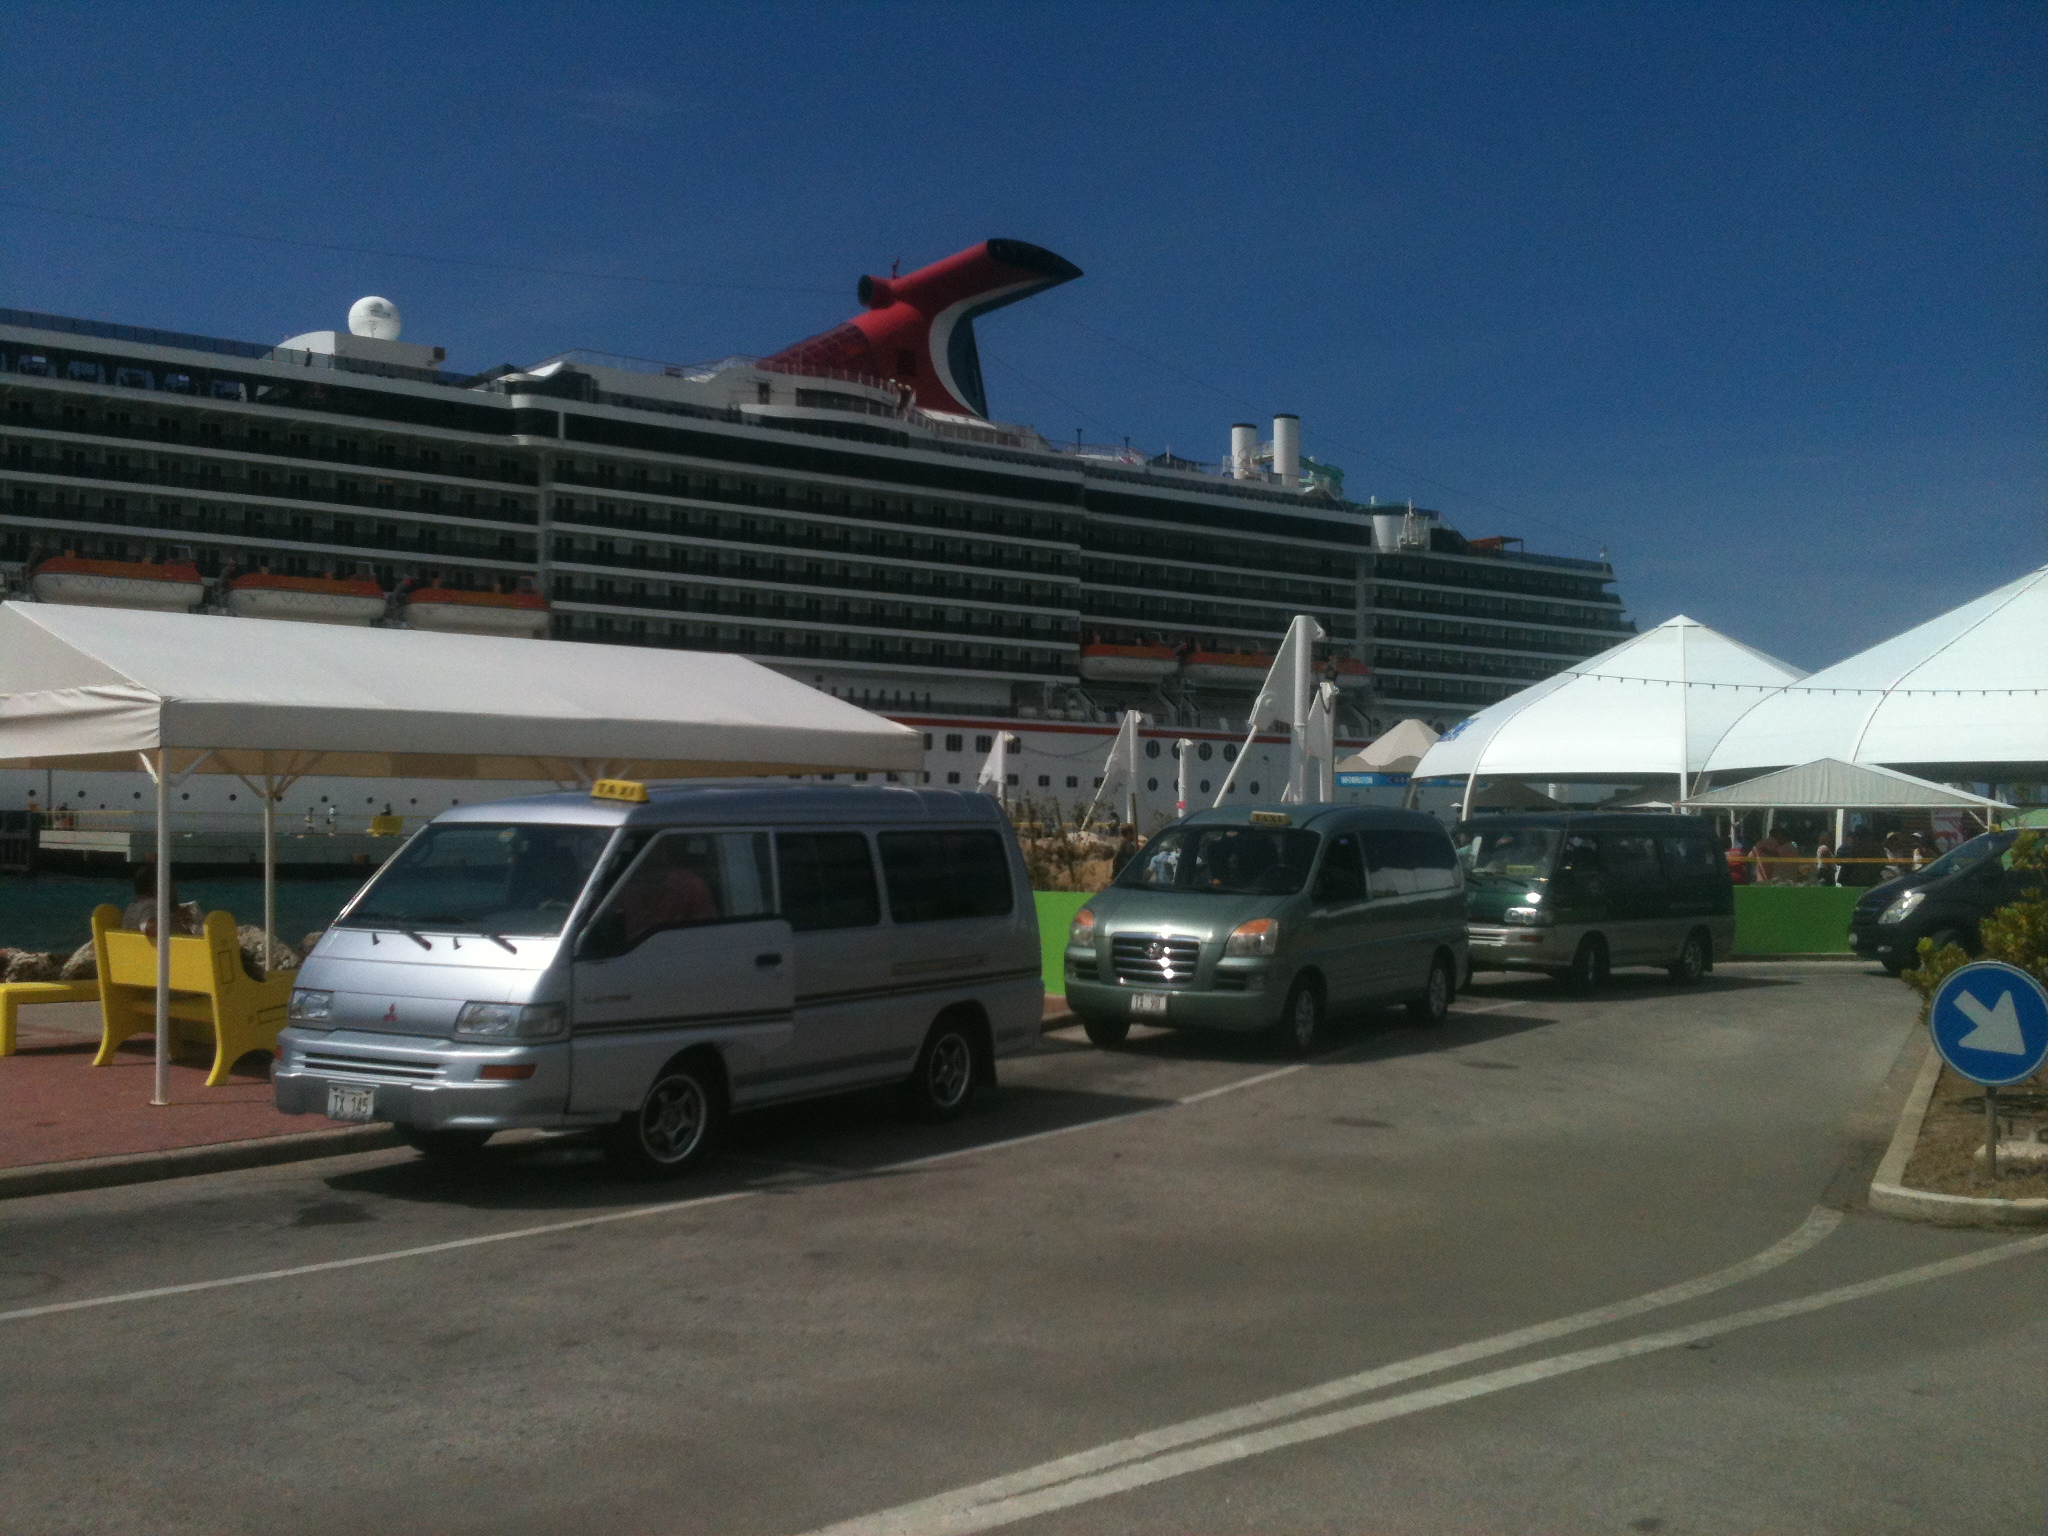 Carnival cruise at the Mega Cruise peer